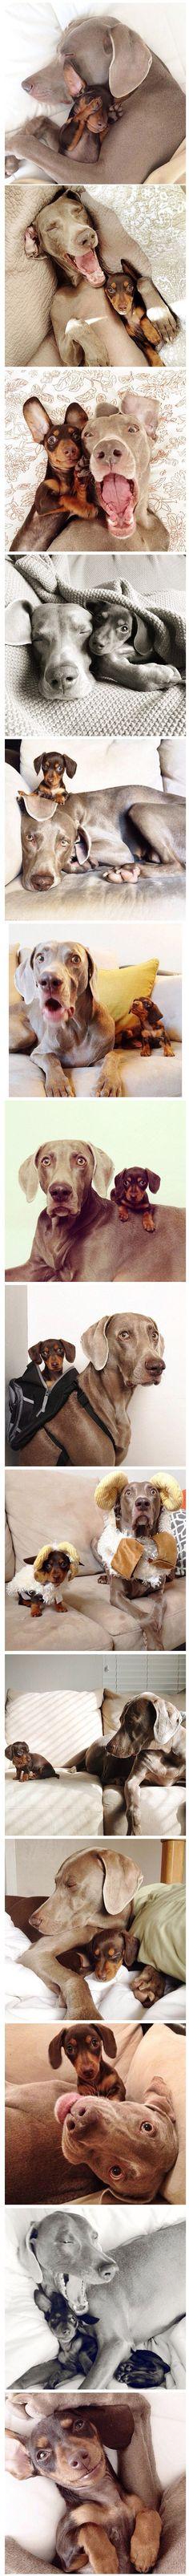 Precious doggie friendship!